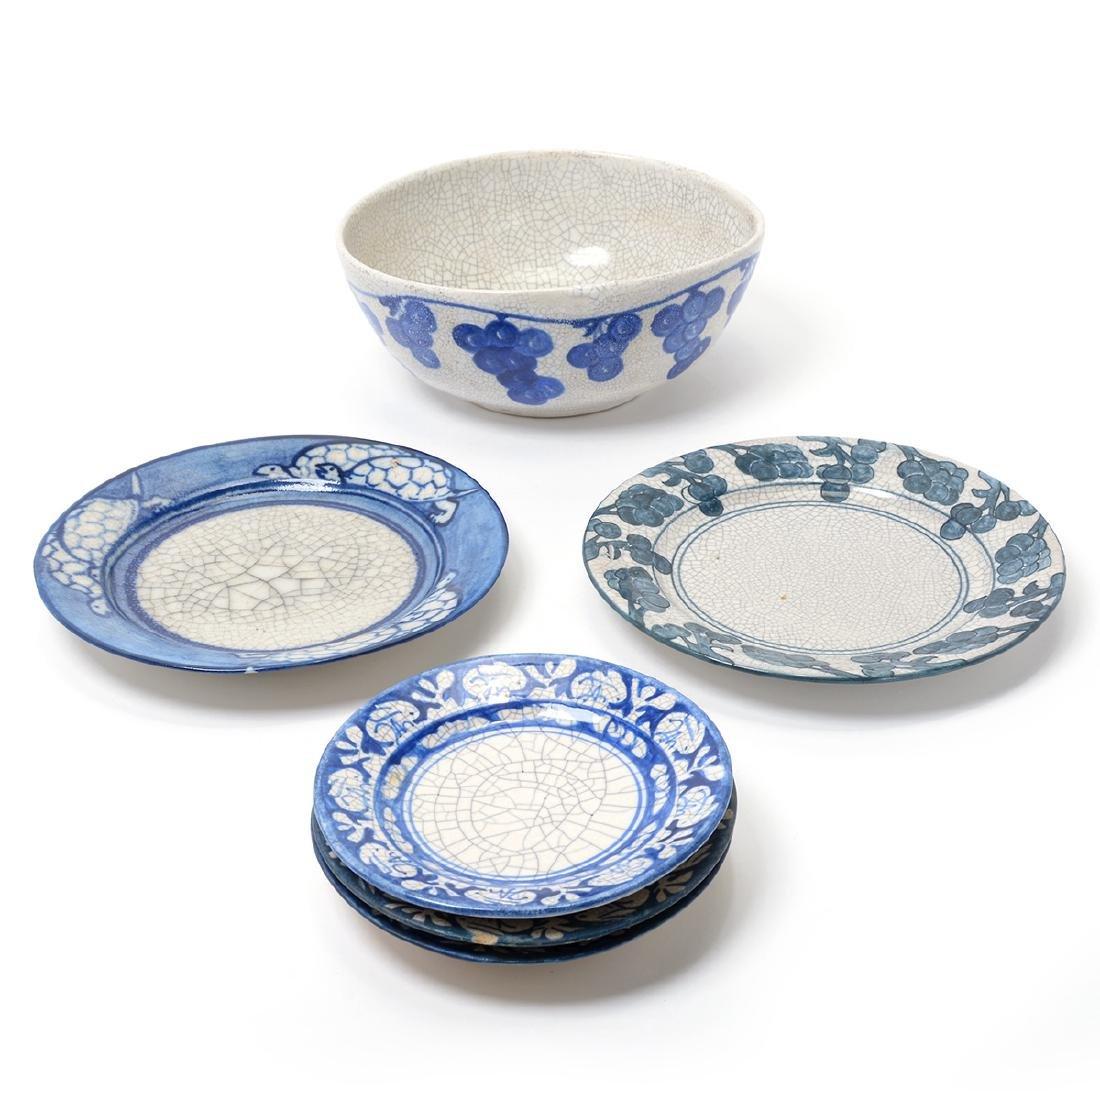 Lot of Dedham Art Pottery: three rabbit plates, a